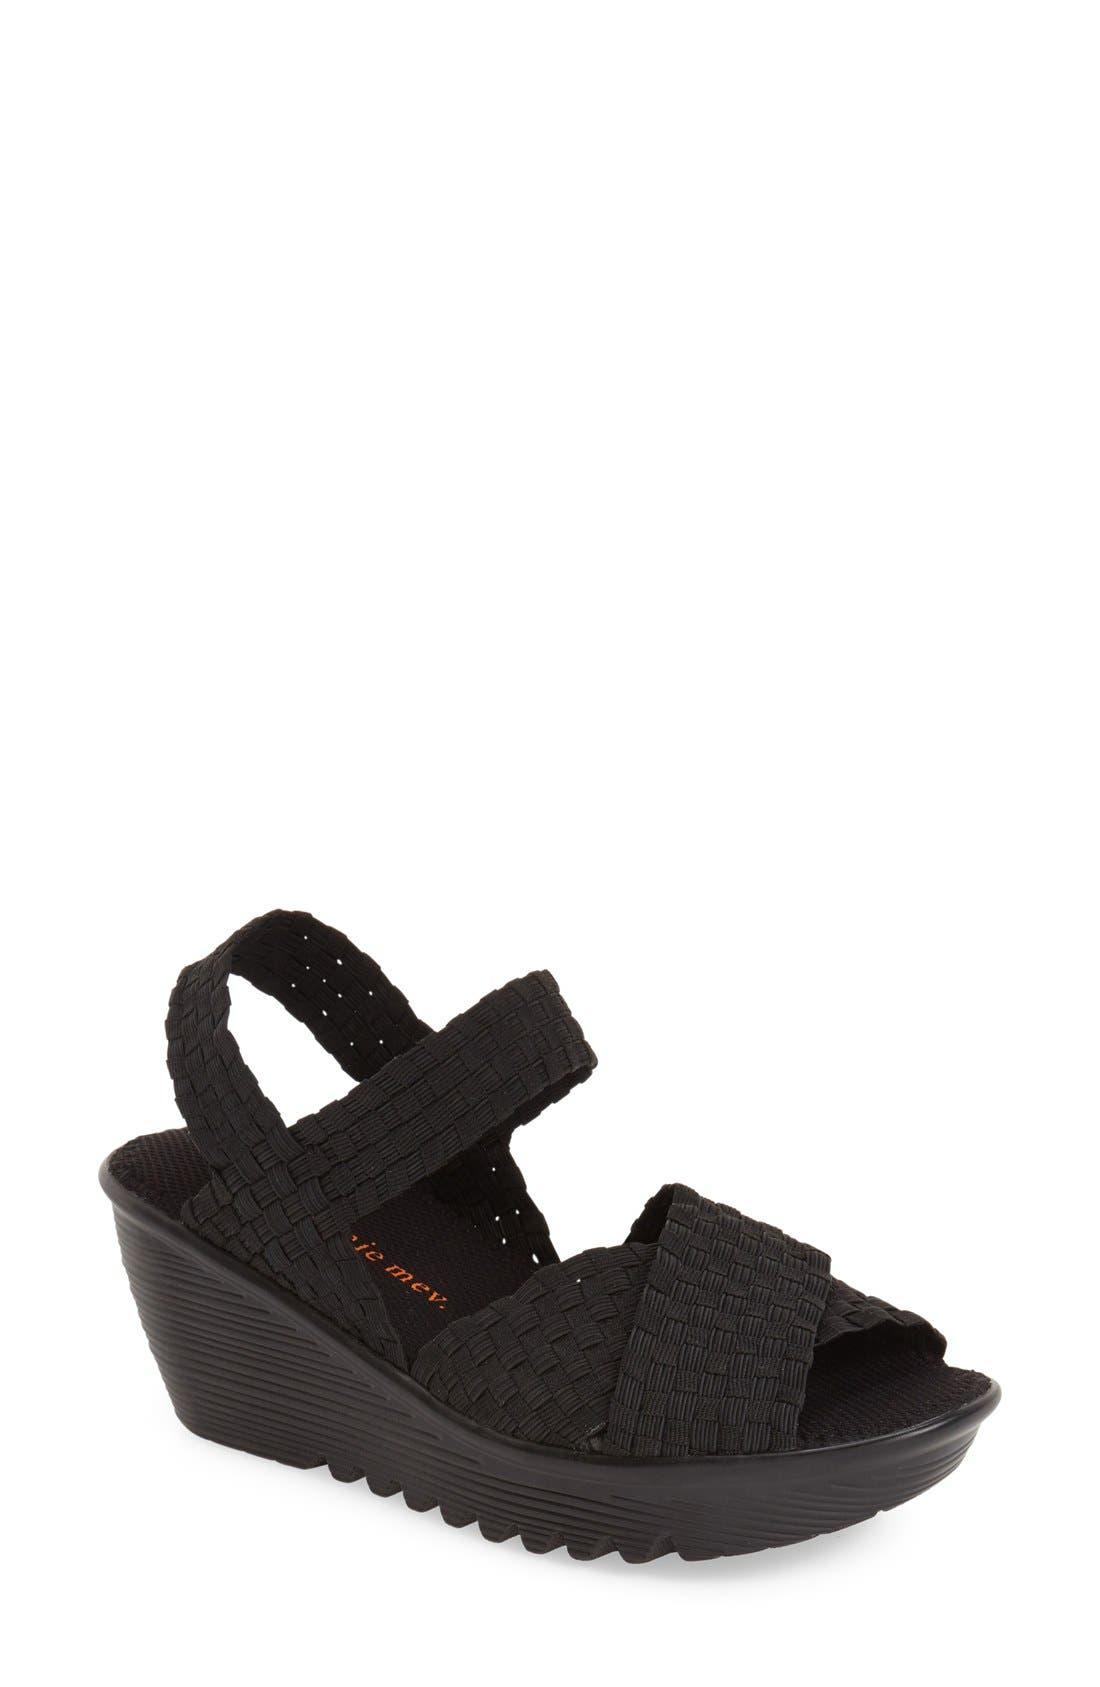 BERNIE MEV.,                             'Buttercup' Woven Platform Wedge Sandal,                             Main thumbnail 1, color,                             BLACK FABRIC